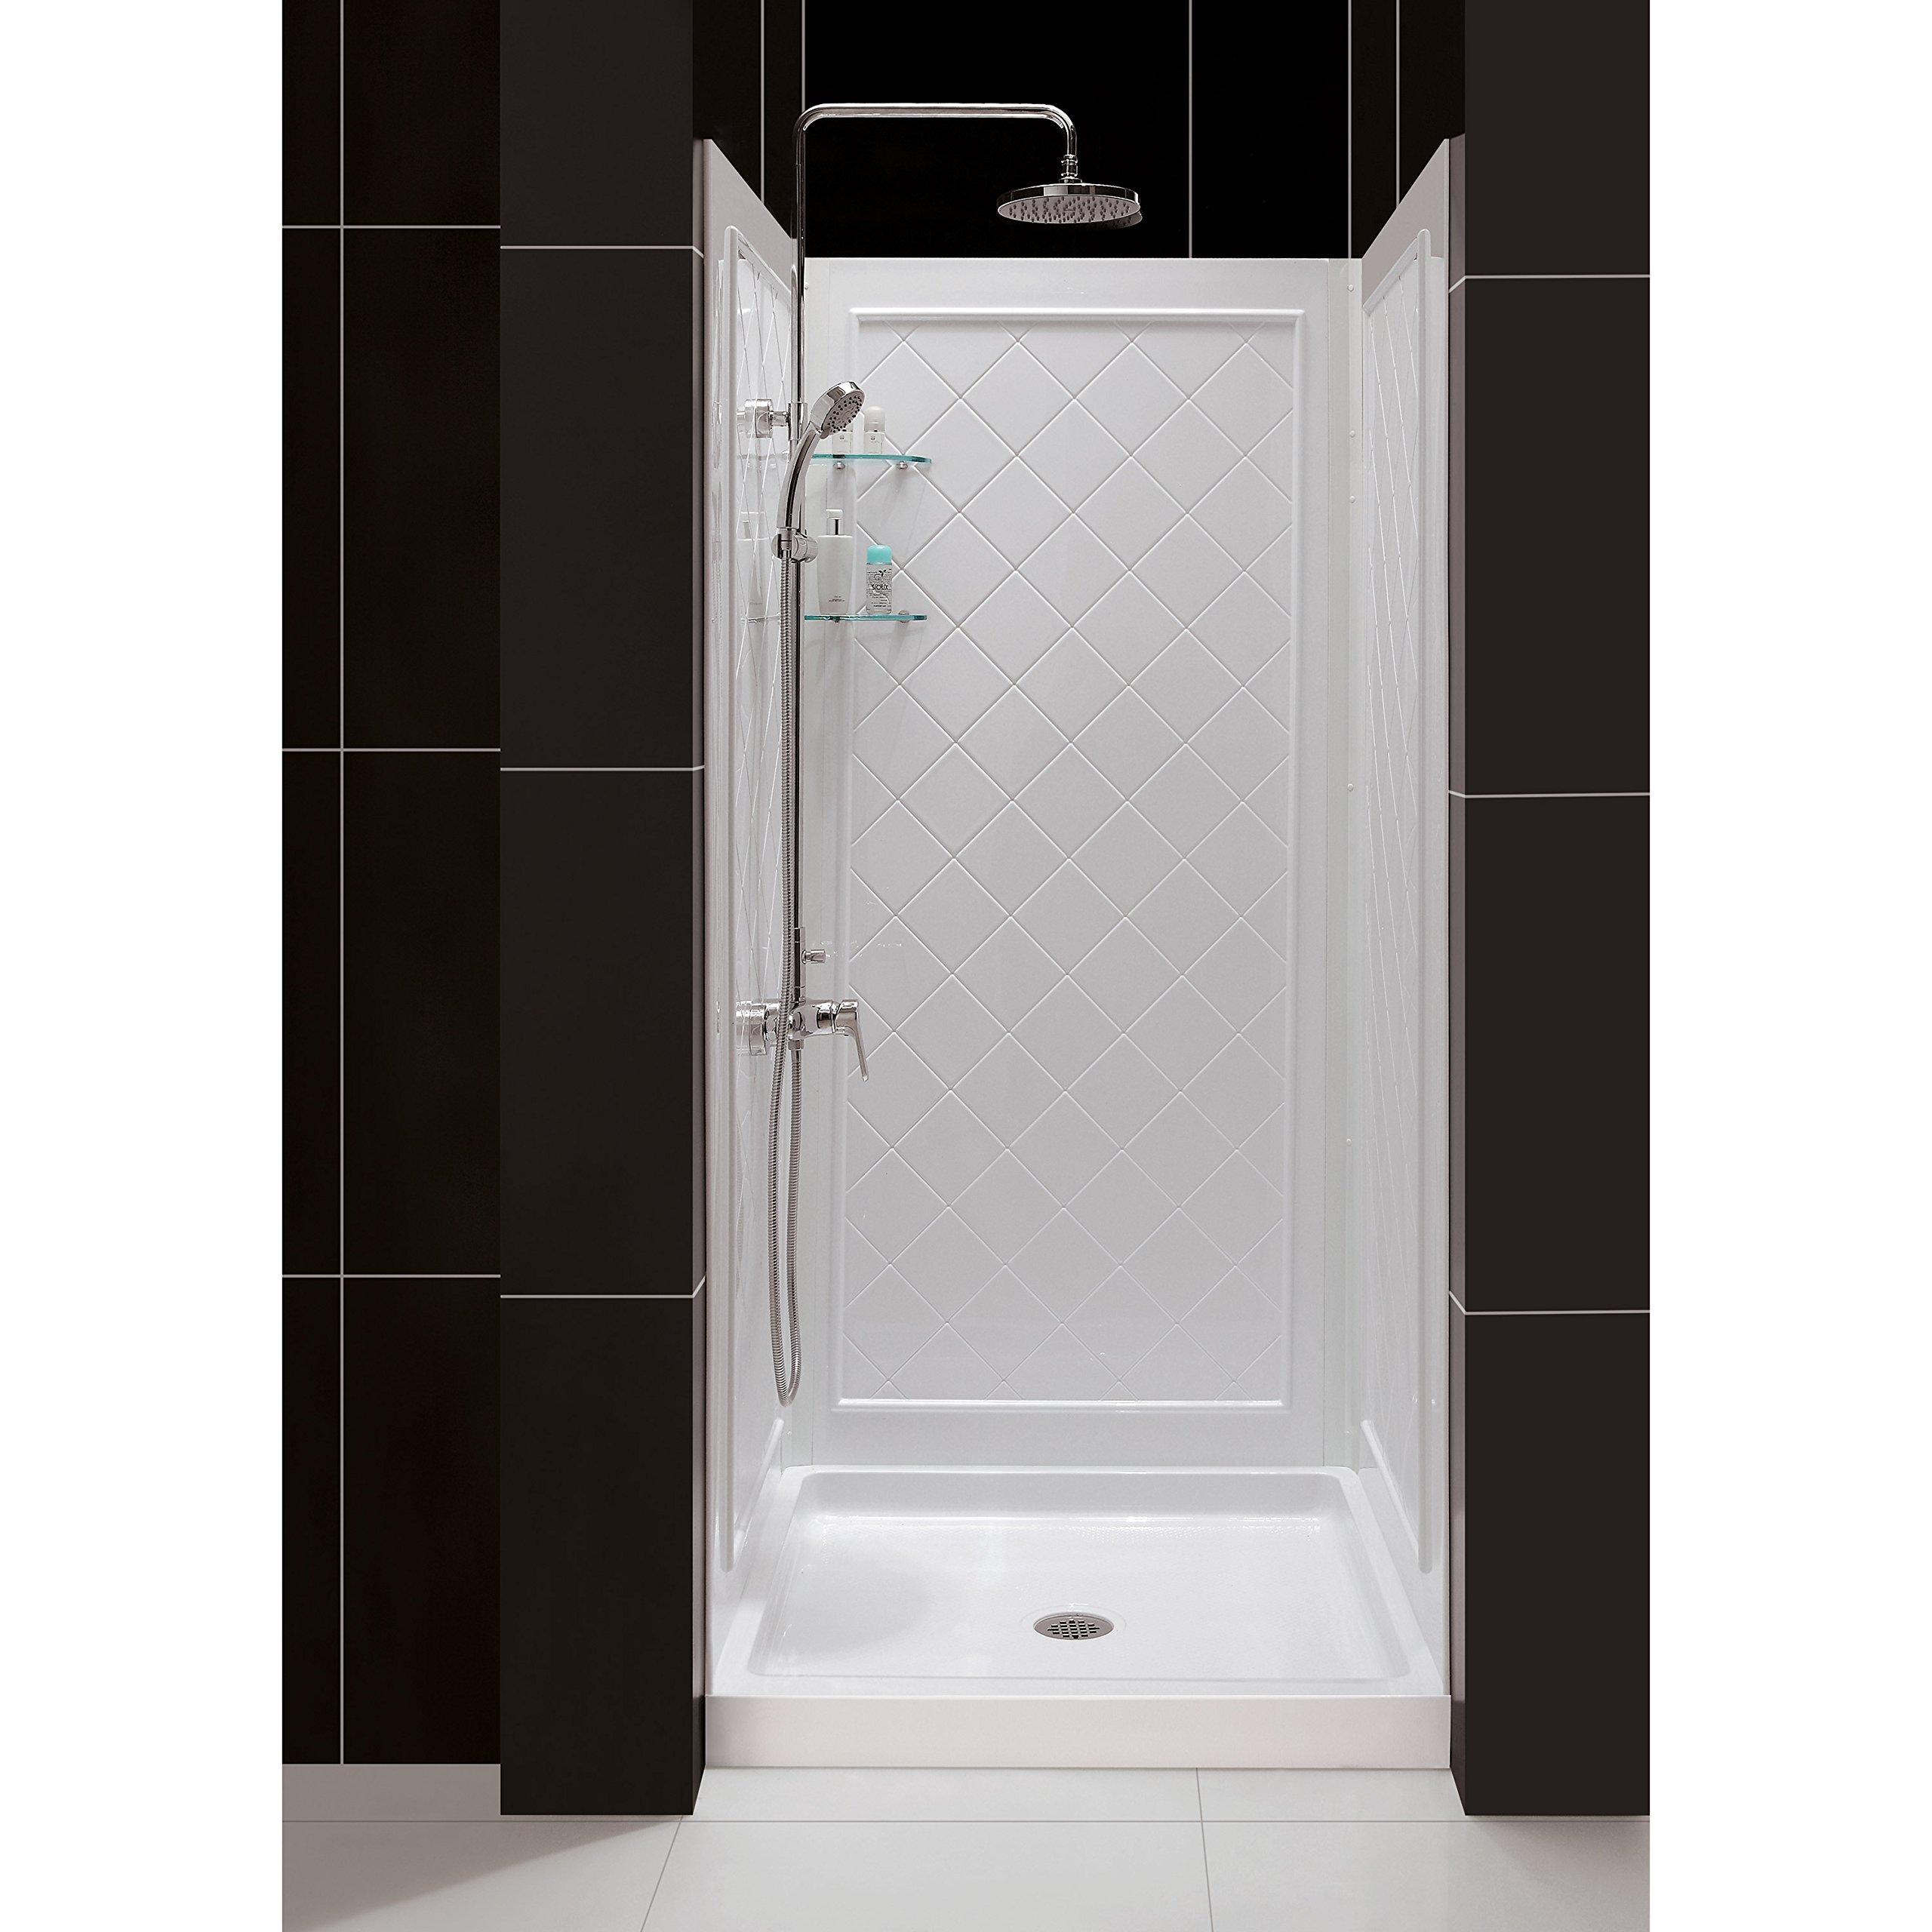 DreamLine SlimLine 32'' by 32'' Shower Base and QWALL-5 Shower Backwall Kit, DL-6195C-01 by DreamLine